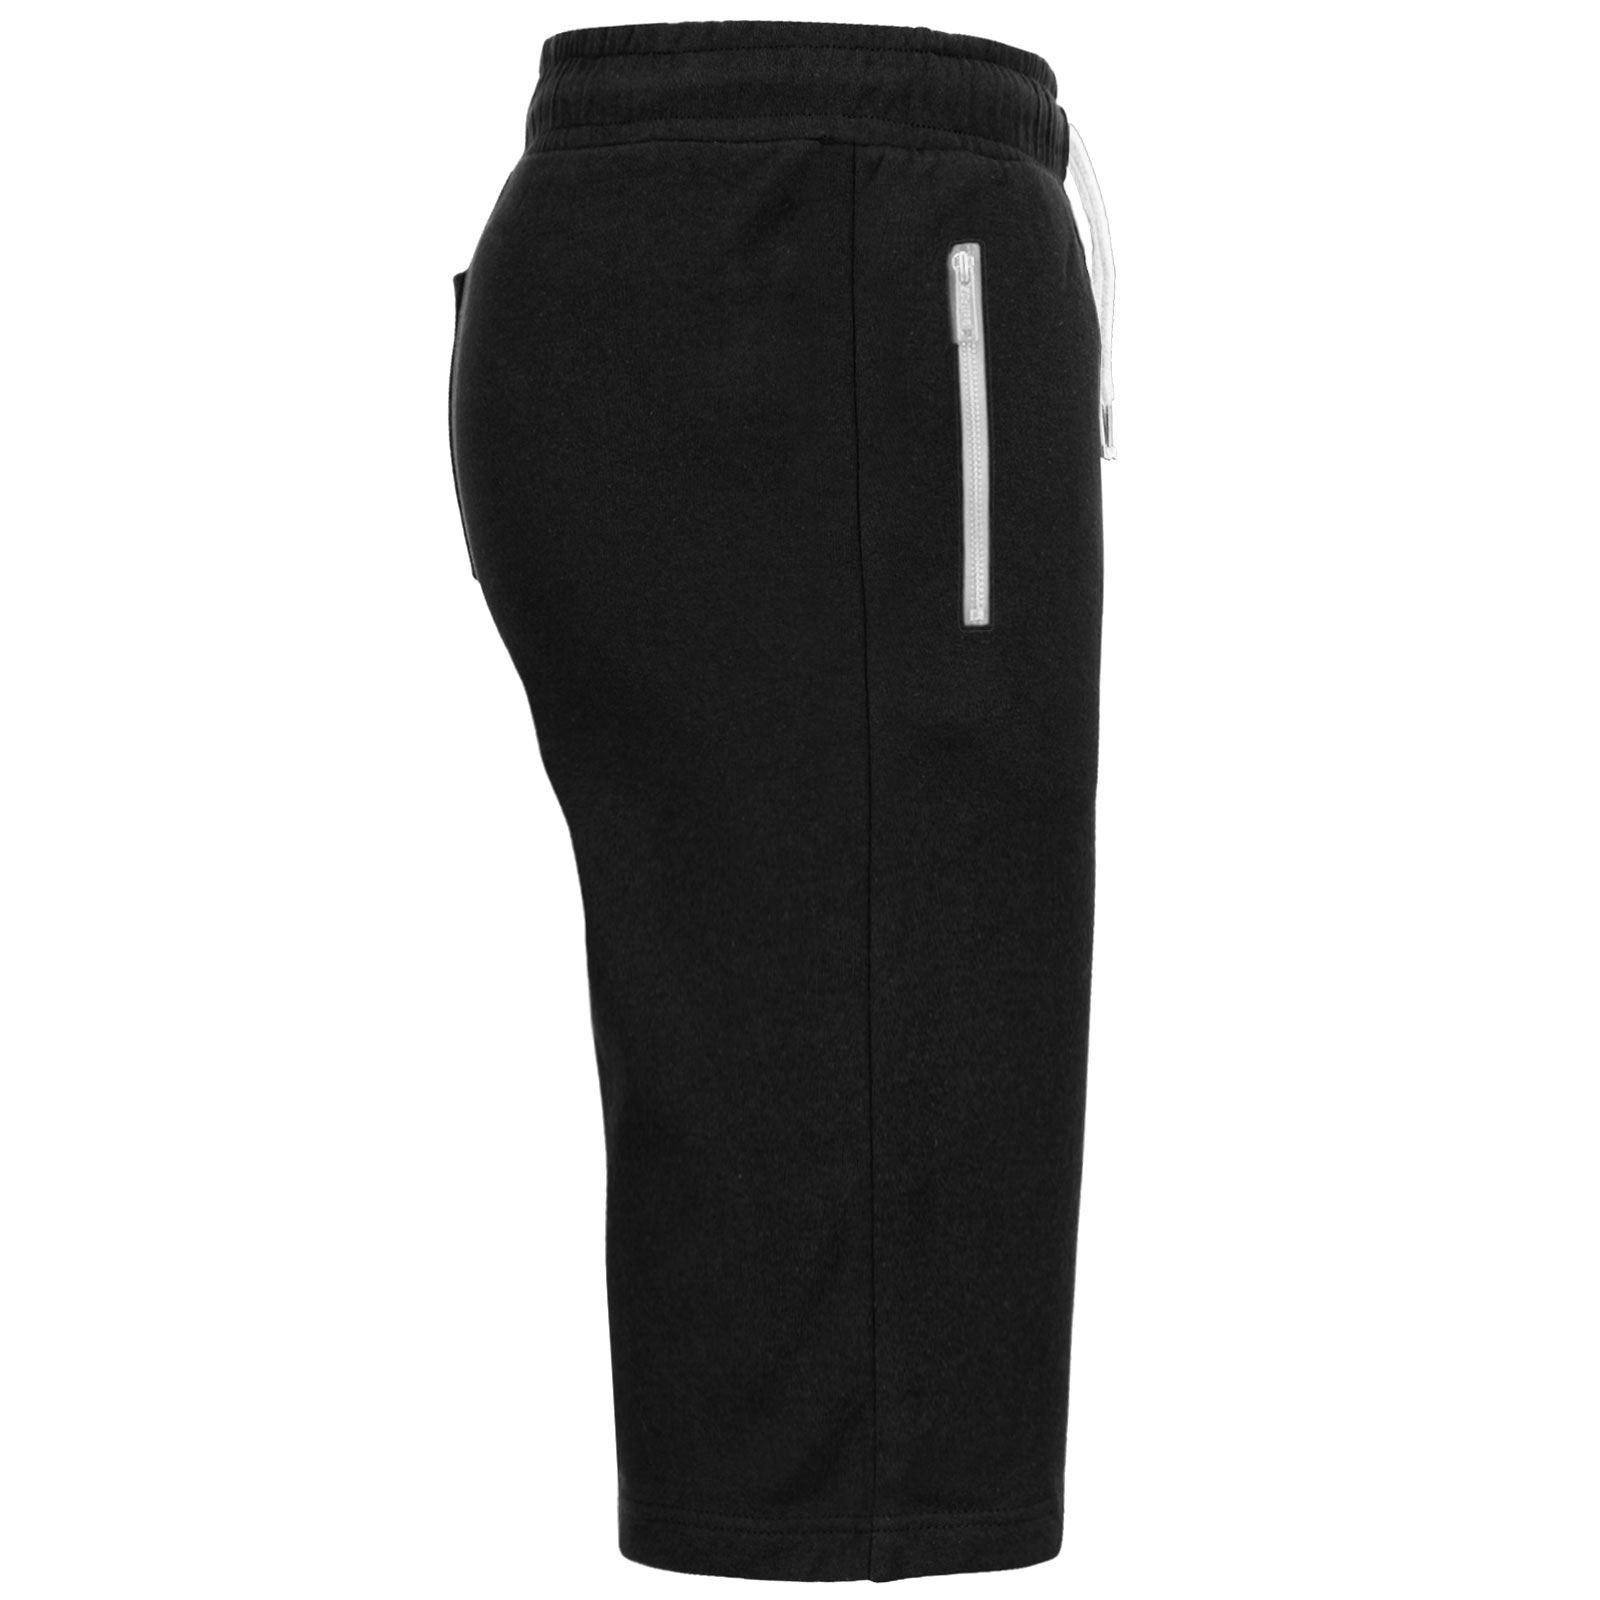 Pantaloncini da uomo 3//4 Sudore Jogger Estate Tasca Fleece Jersey Sport da Palestra Corsa Pantaloni